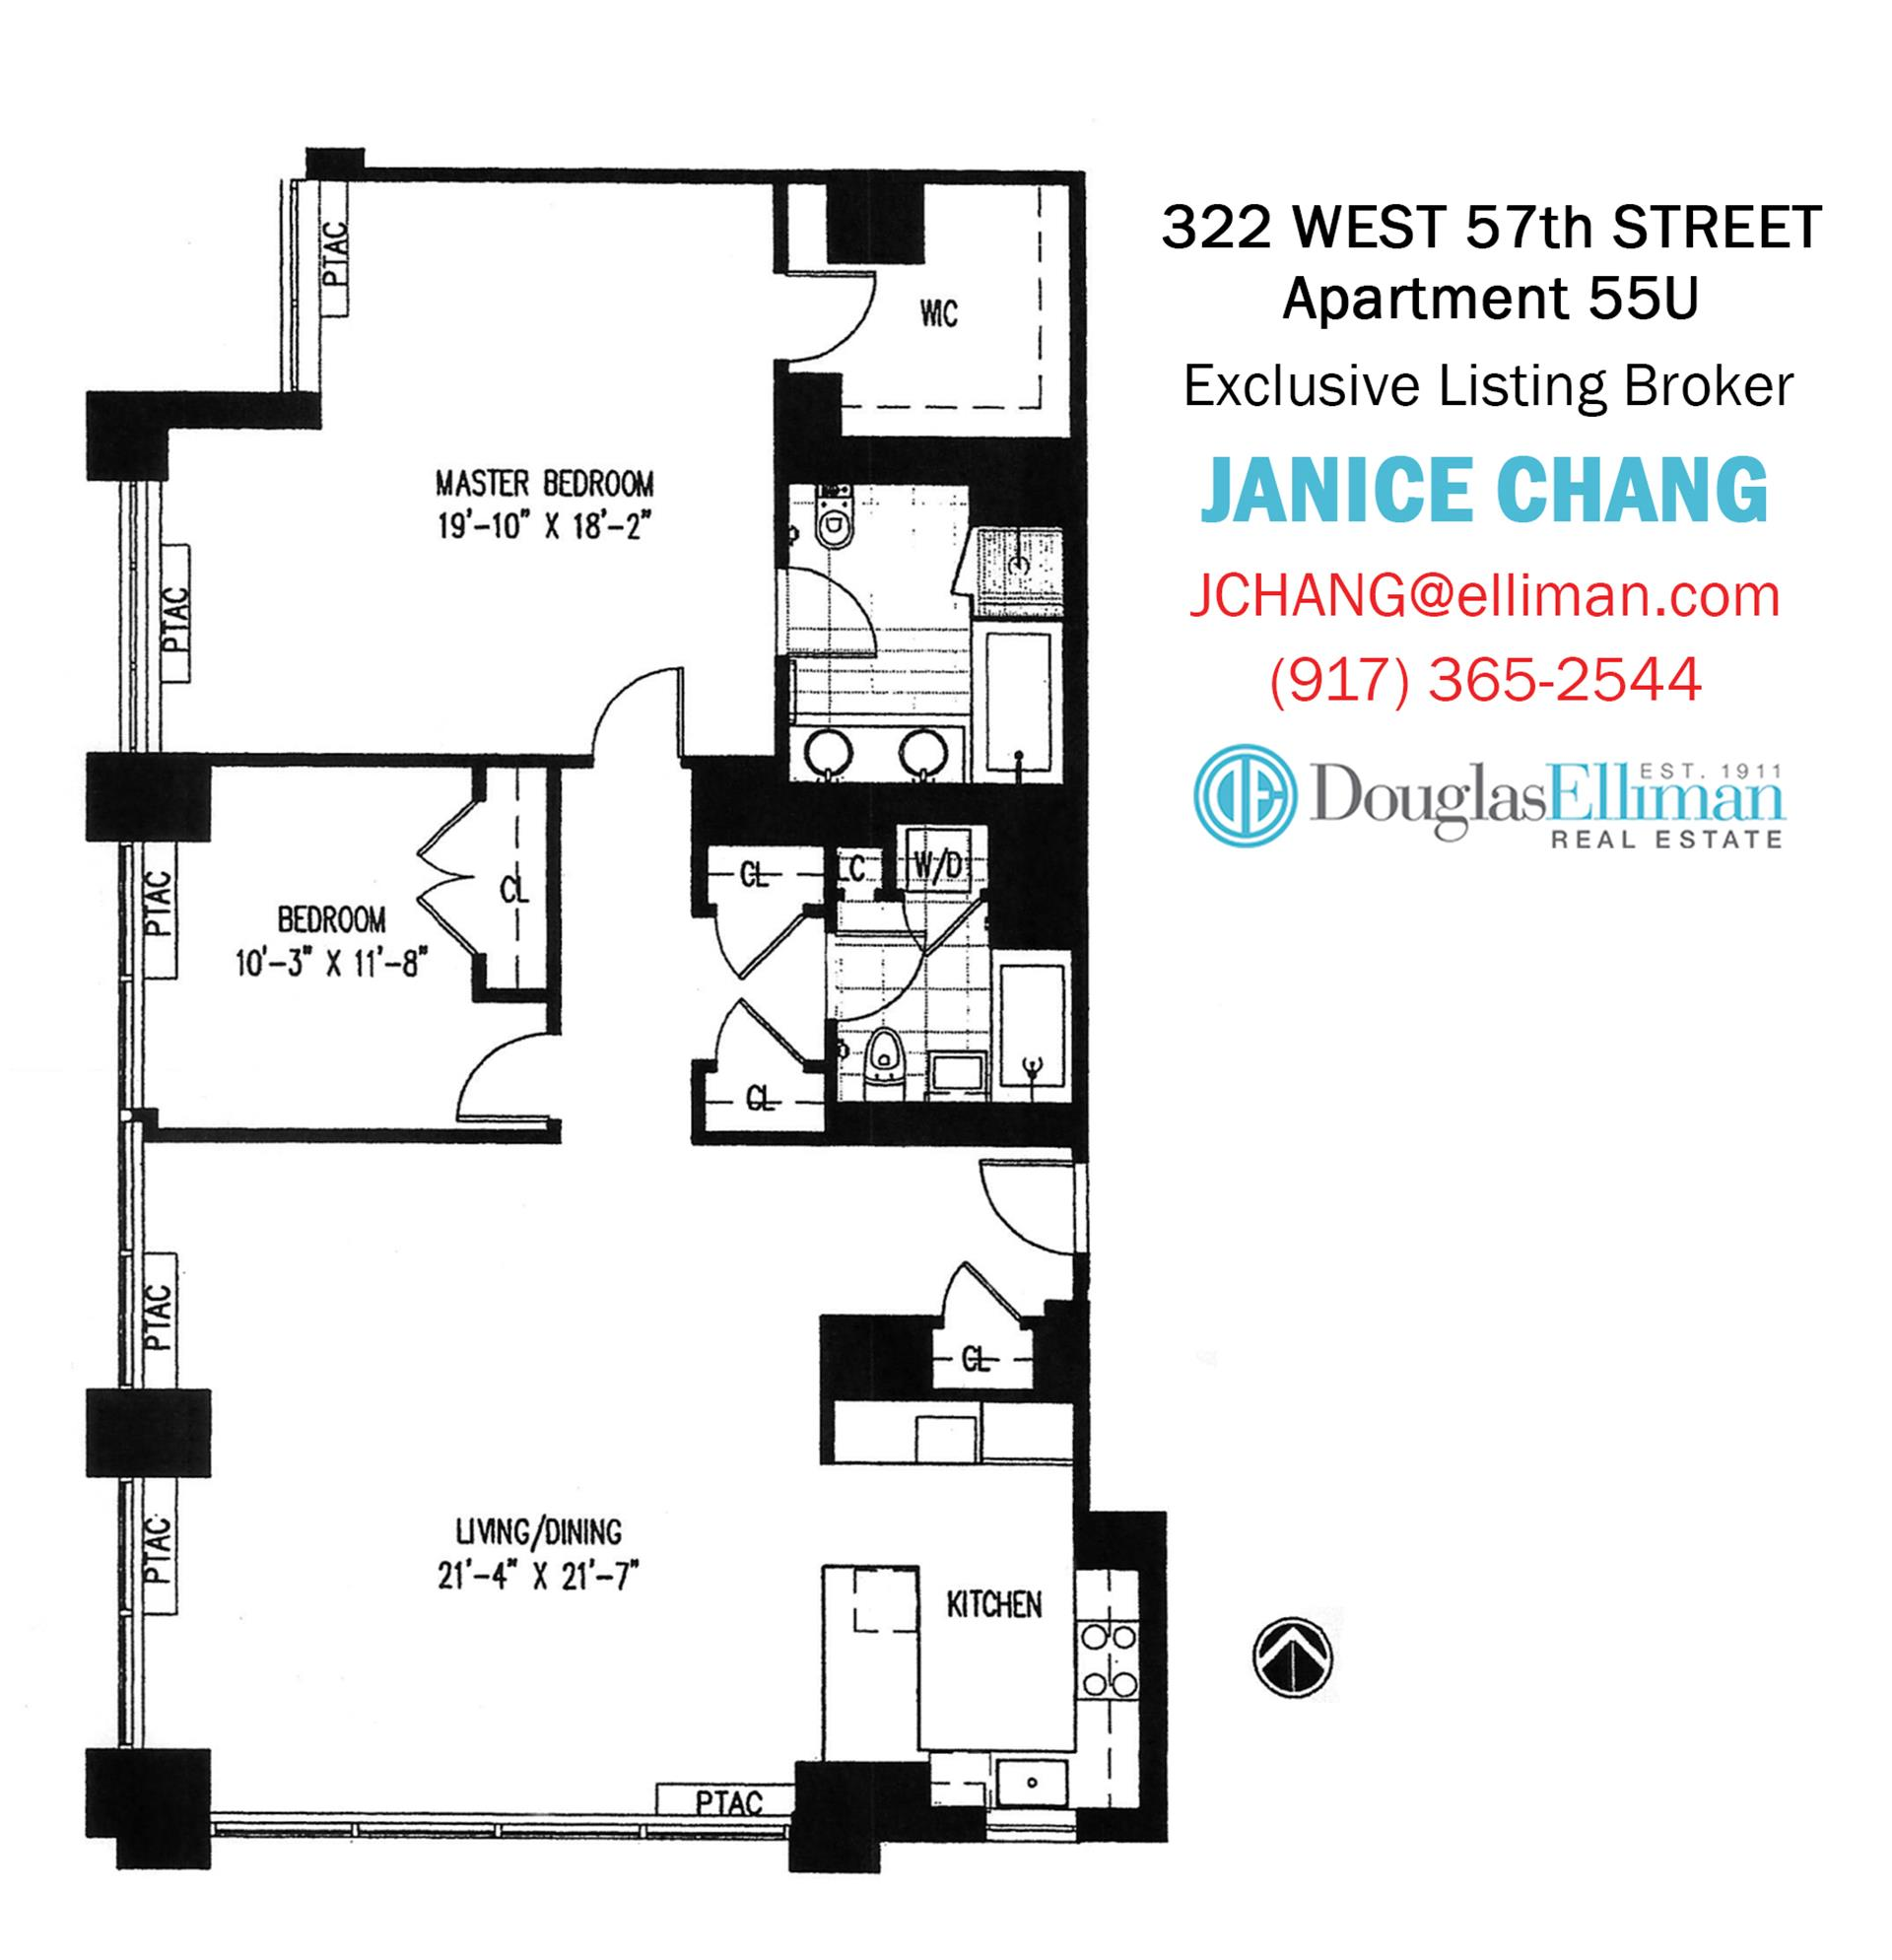 Floor plan of 322 West 57th St, 55U1 - Midtown, New York